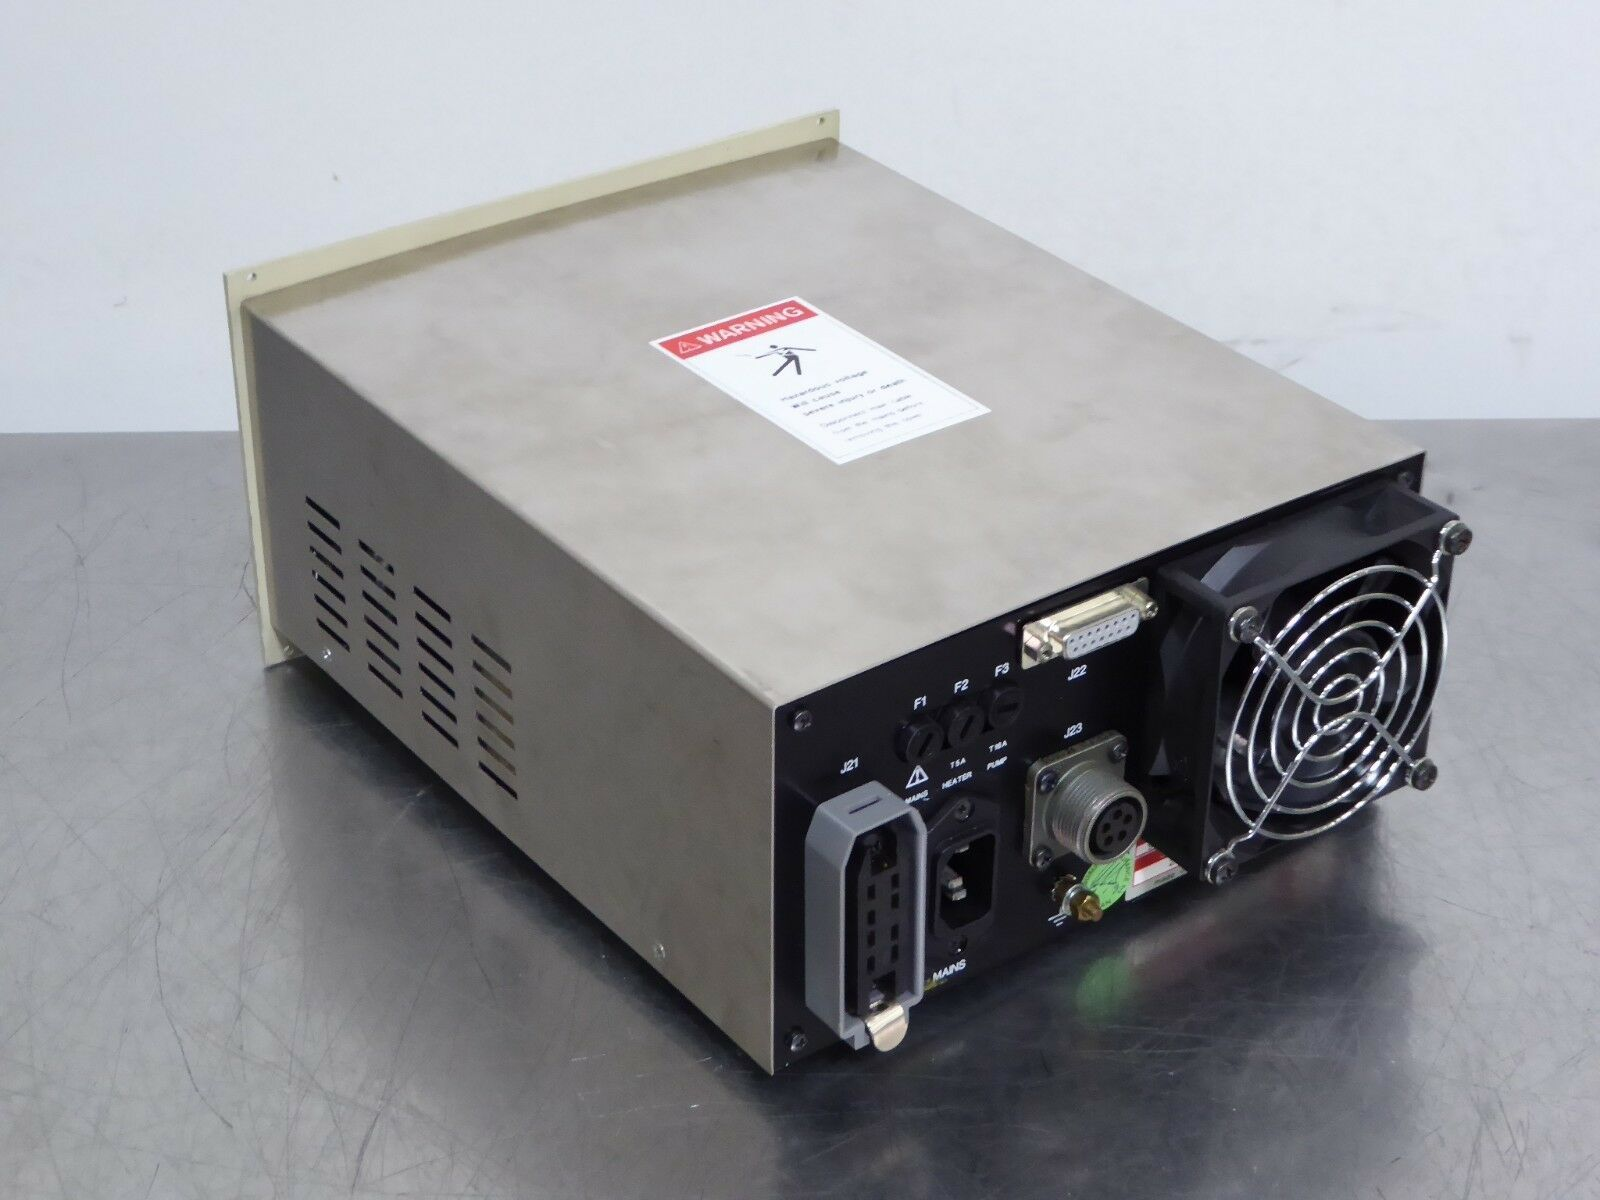 T149916 Varian Turbo-V450 Turbo Pump Controller 96